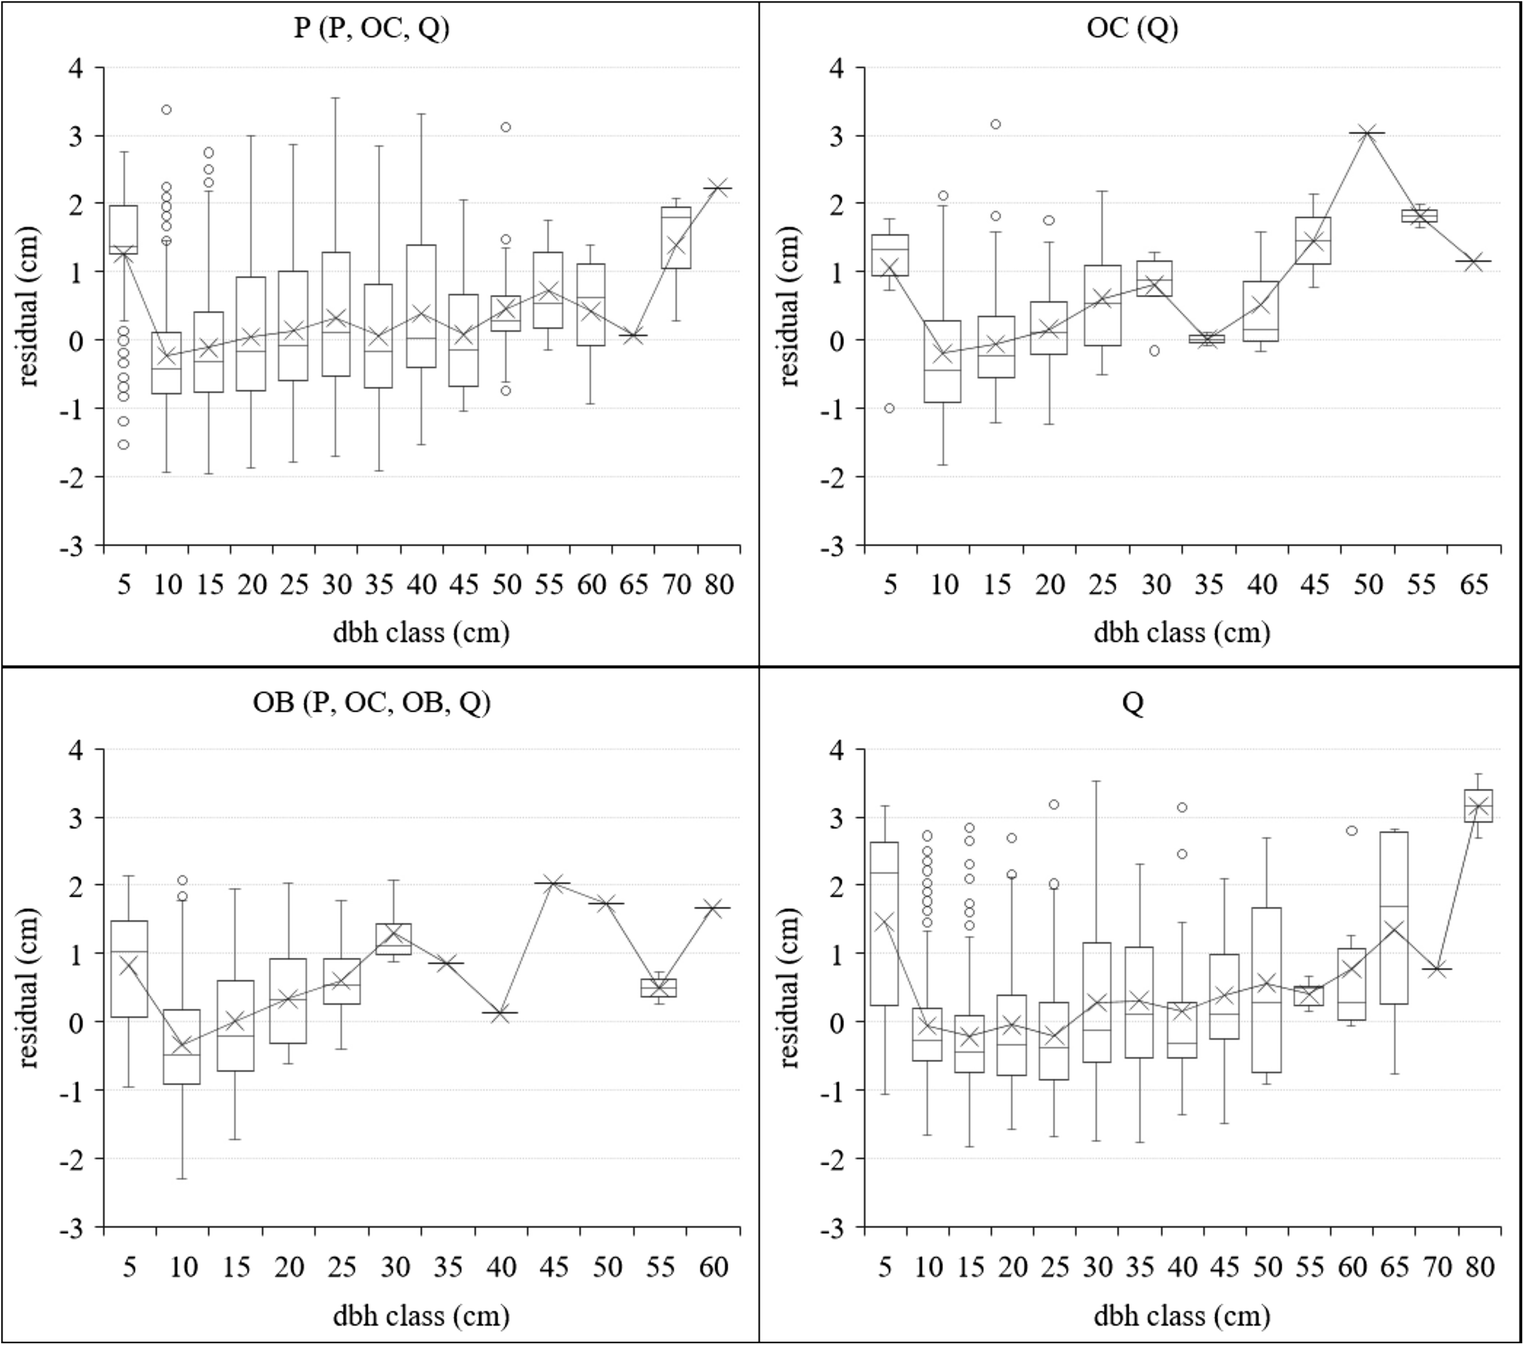 Considering neighborhood effects improves individual dbh